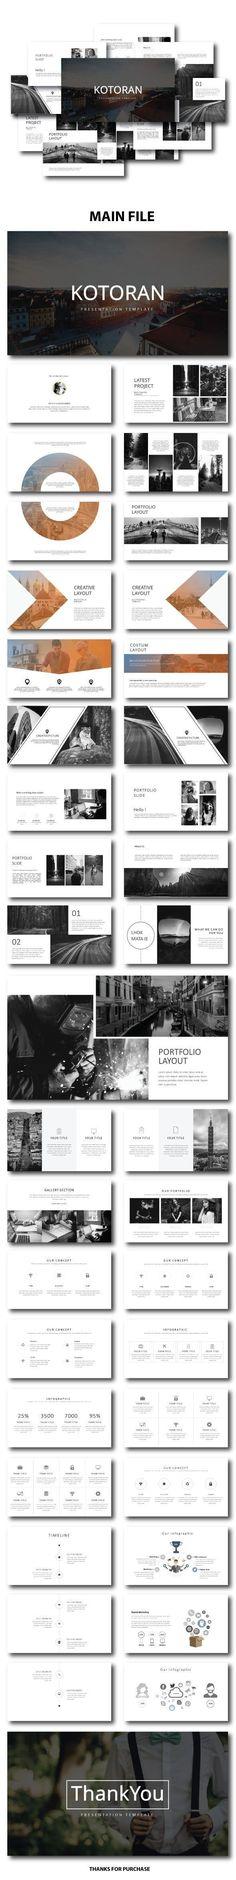 Kotoran Presentation Template - #PowerPoint Templates Presentation Templates